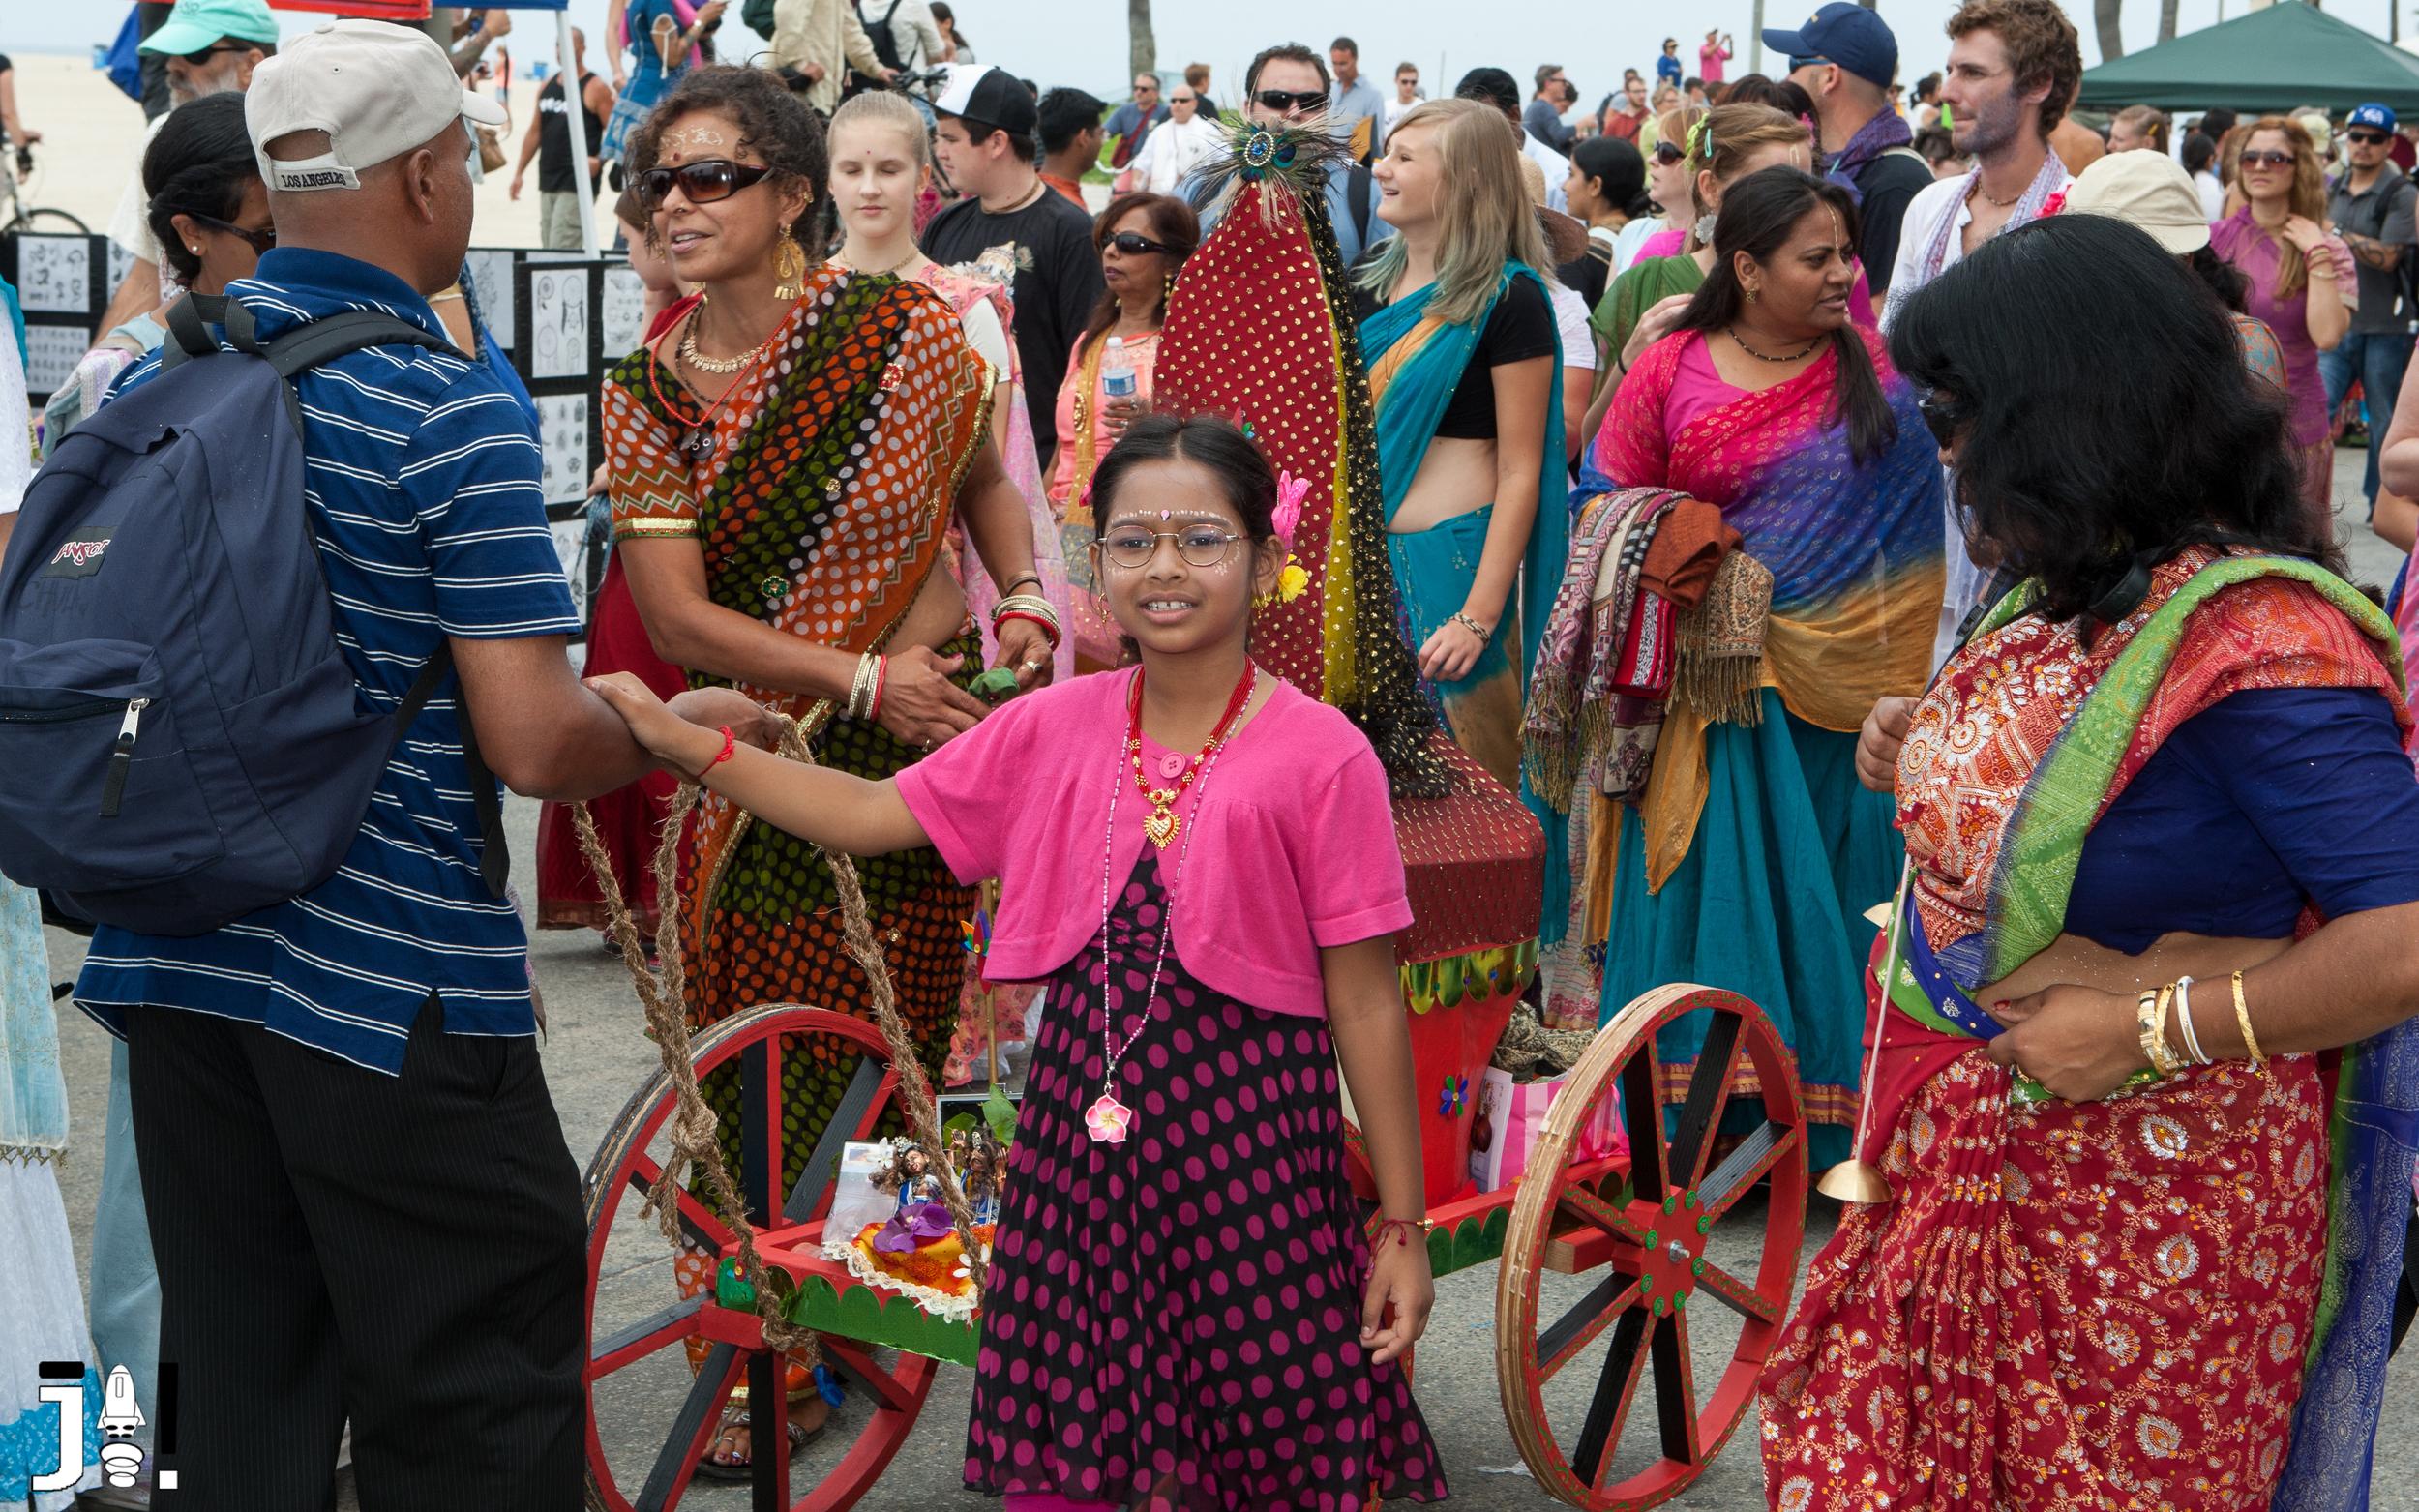 Hari Krishna Parade on Venice Boardwalk-18.jpg